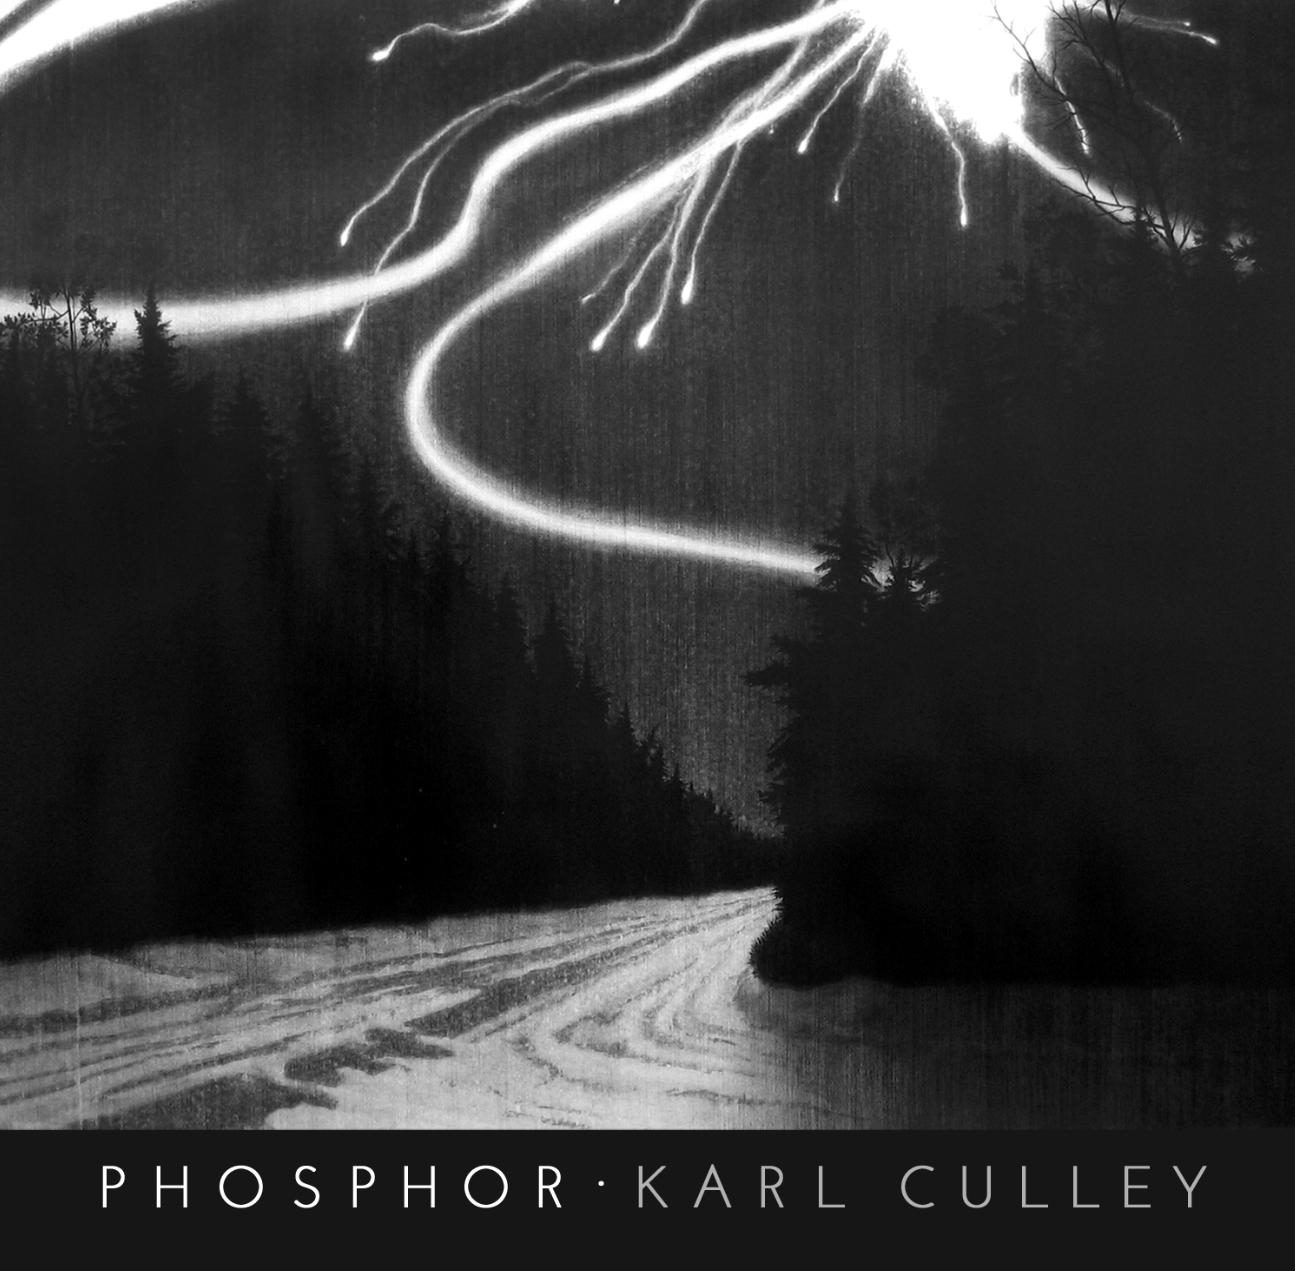 Karl Culley - Phosphor